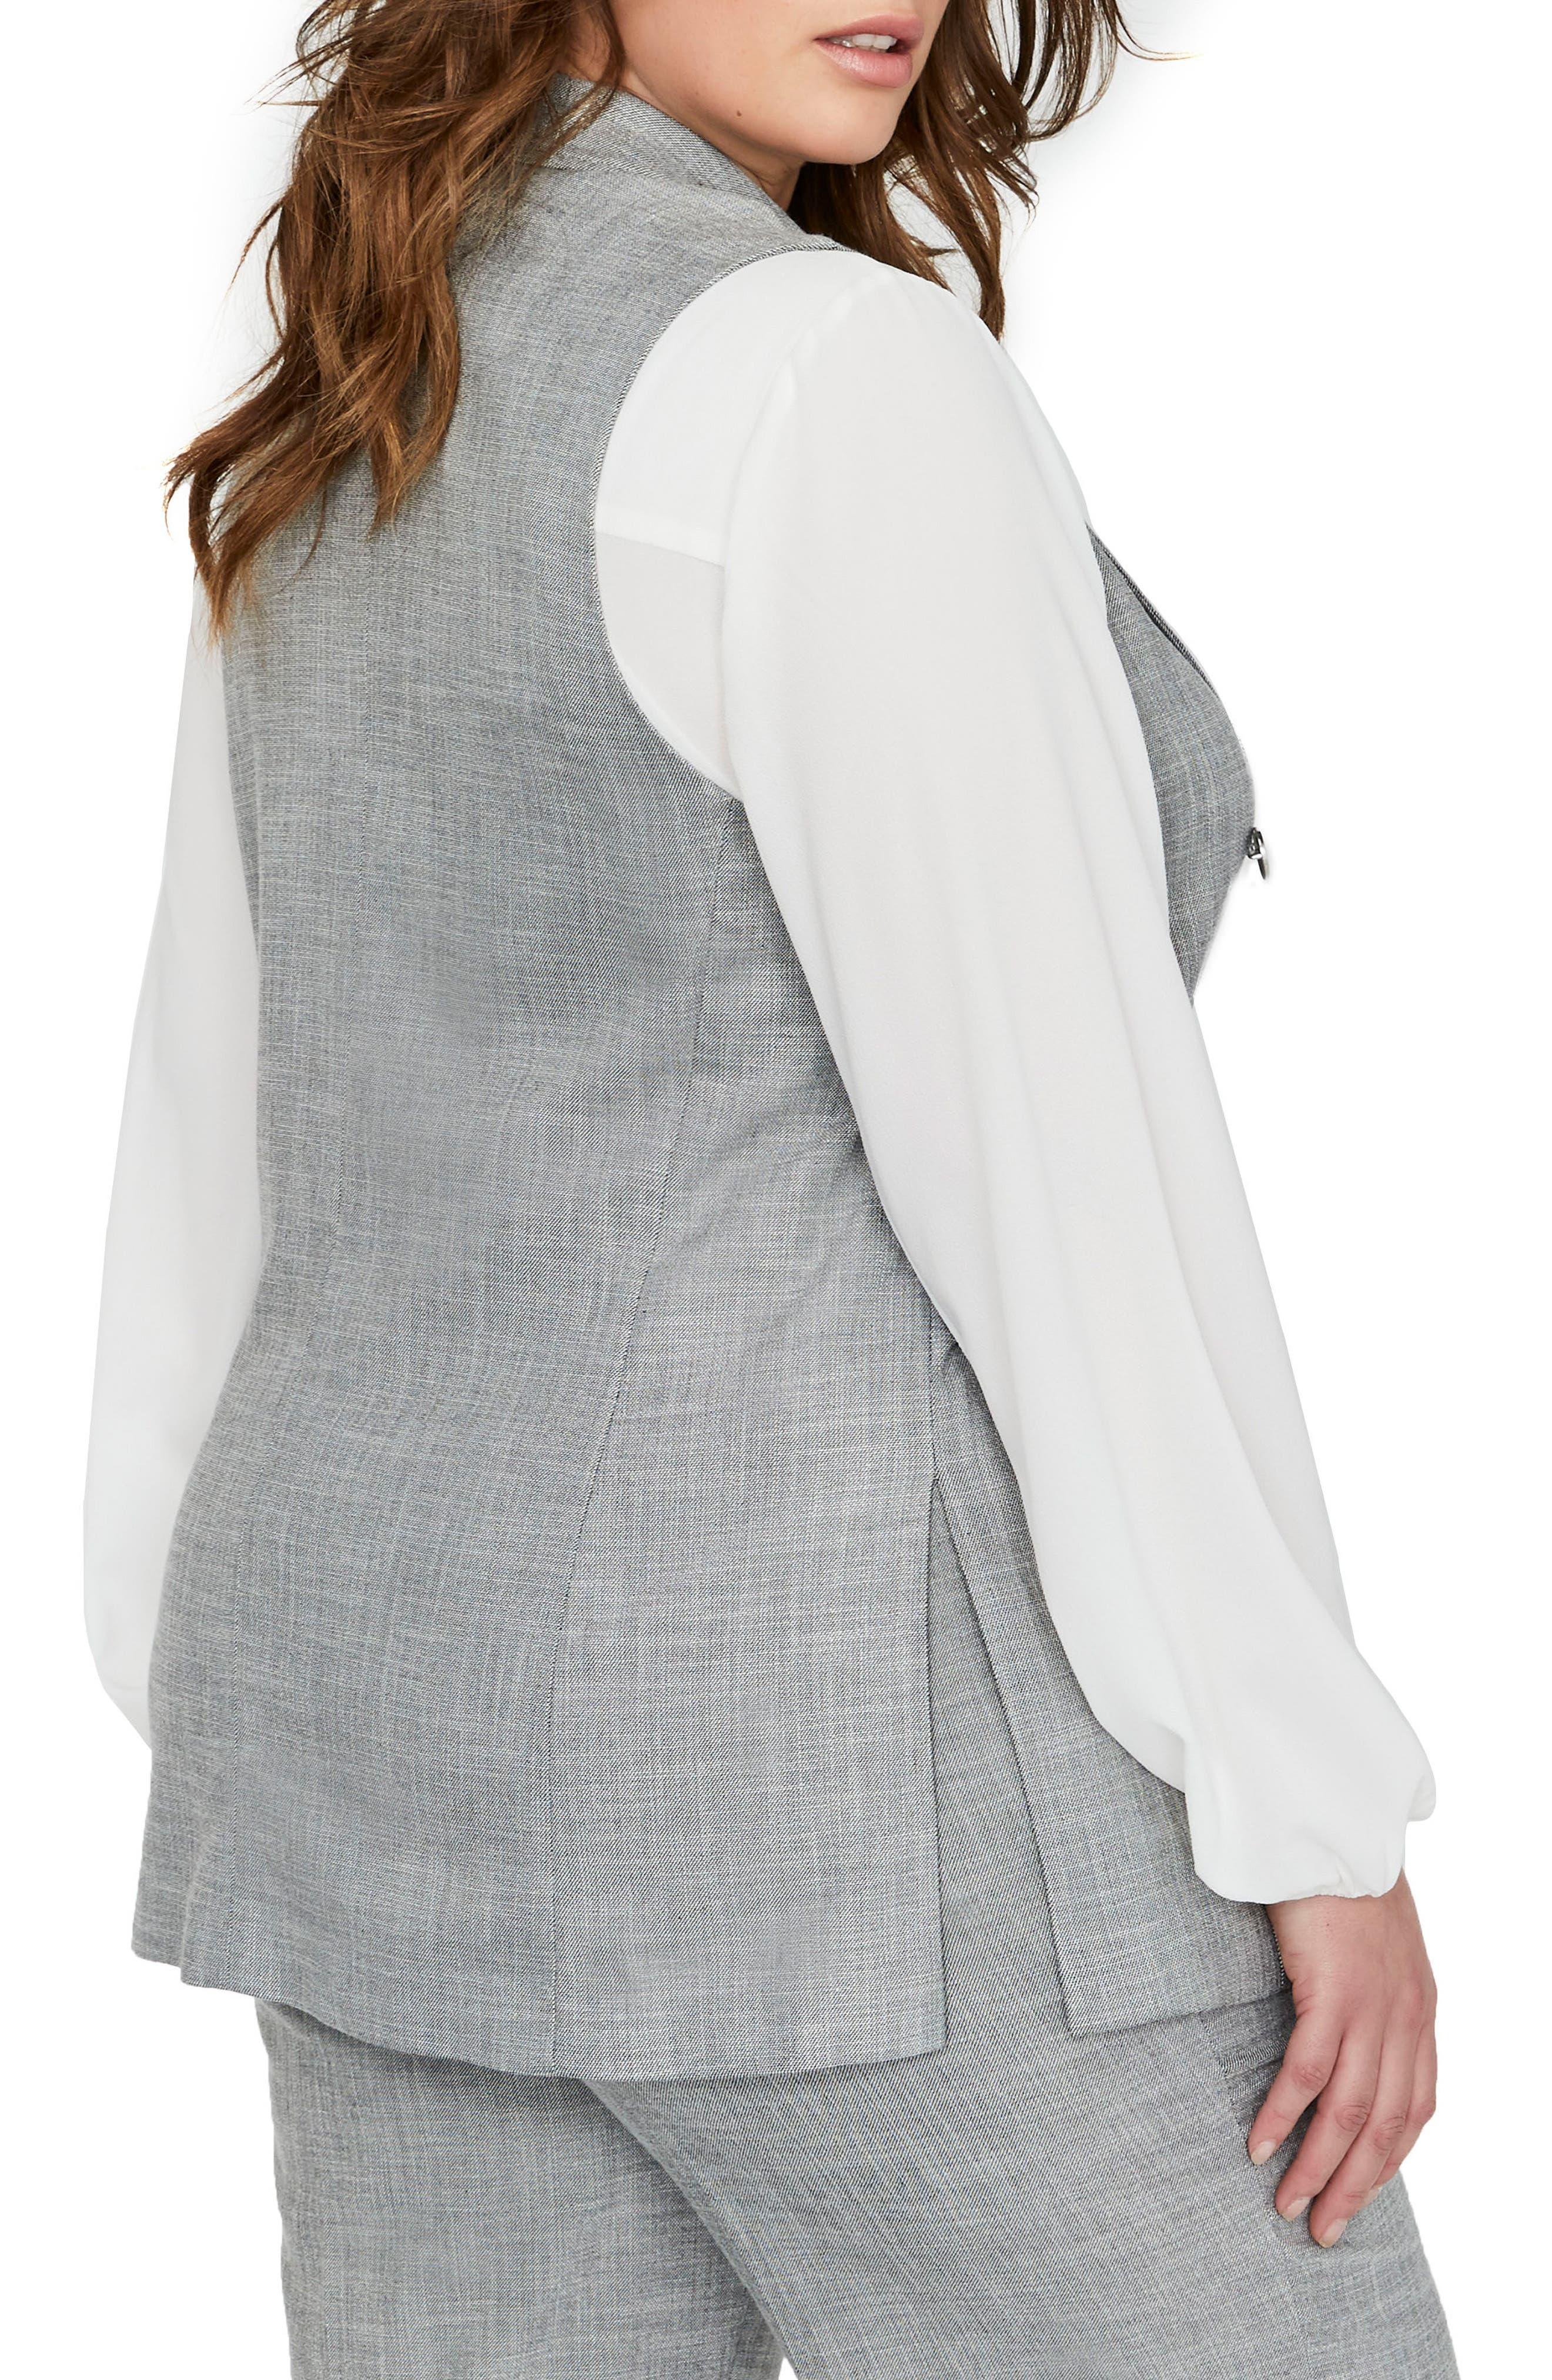 Peak Collar Vest,                             Alternate thumbnail 2, color,                             025